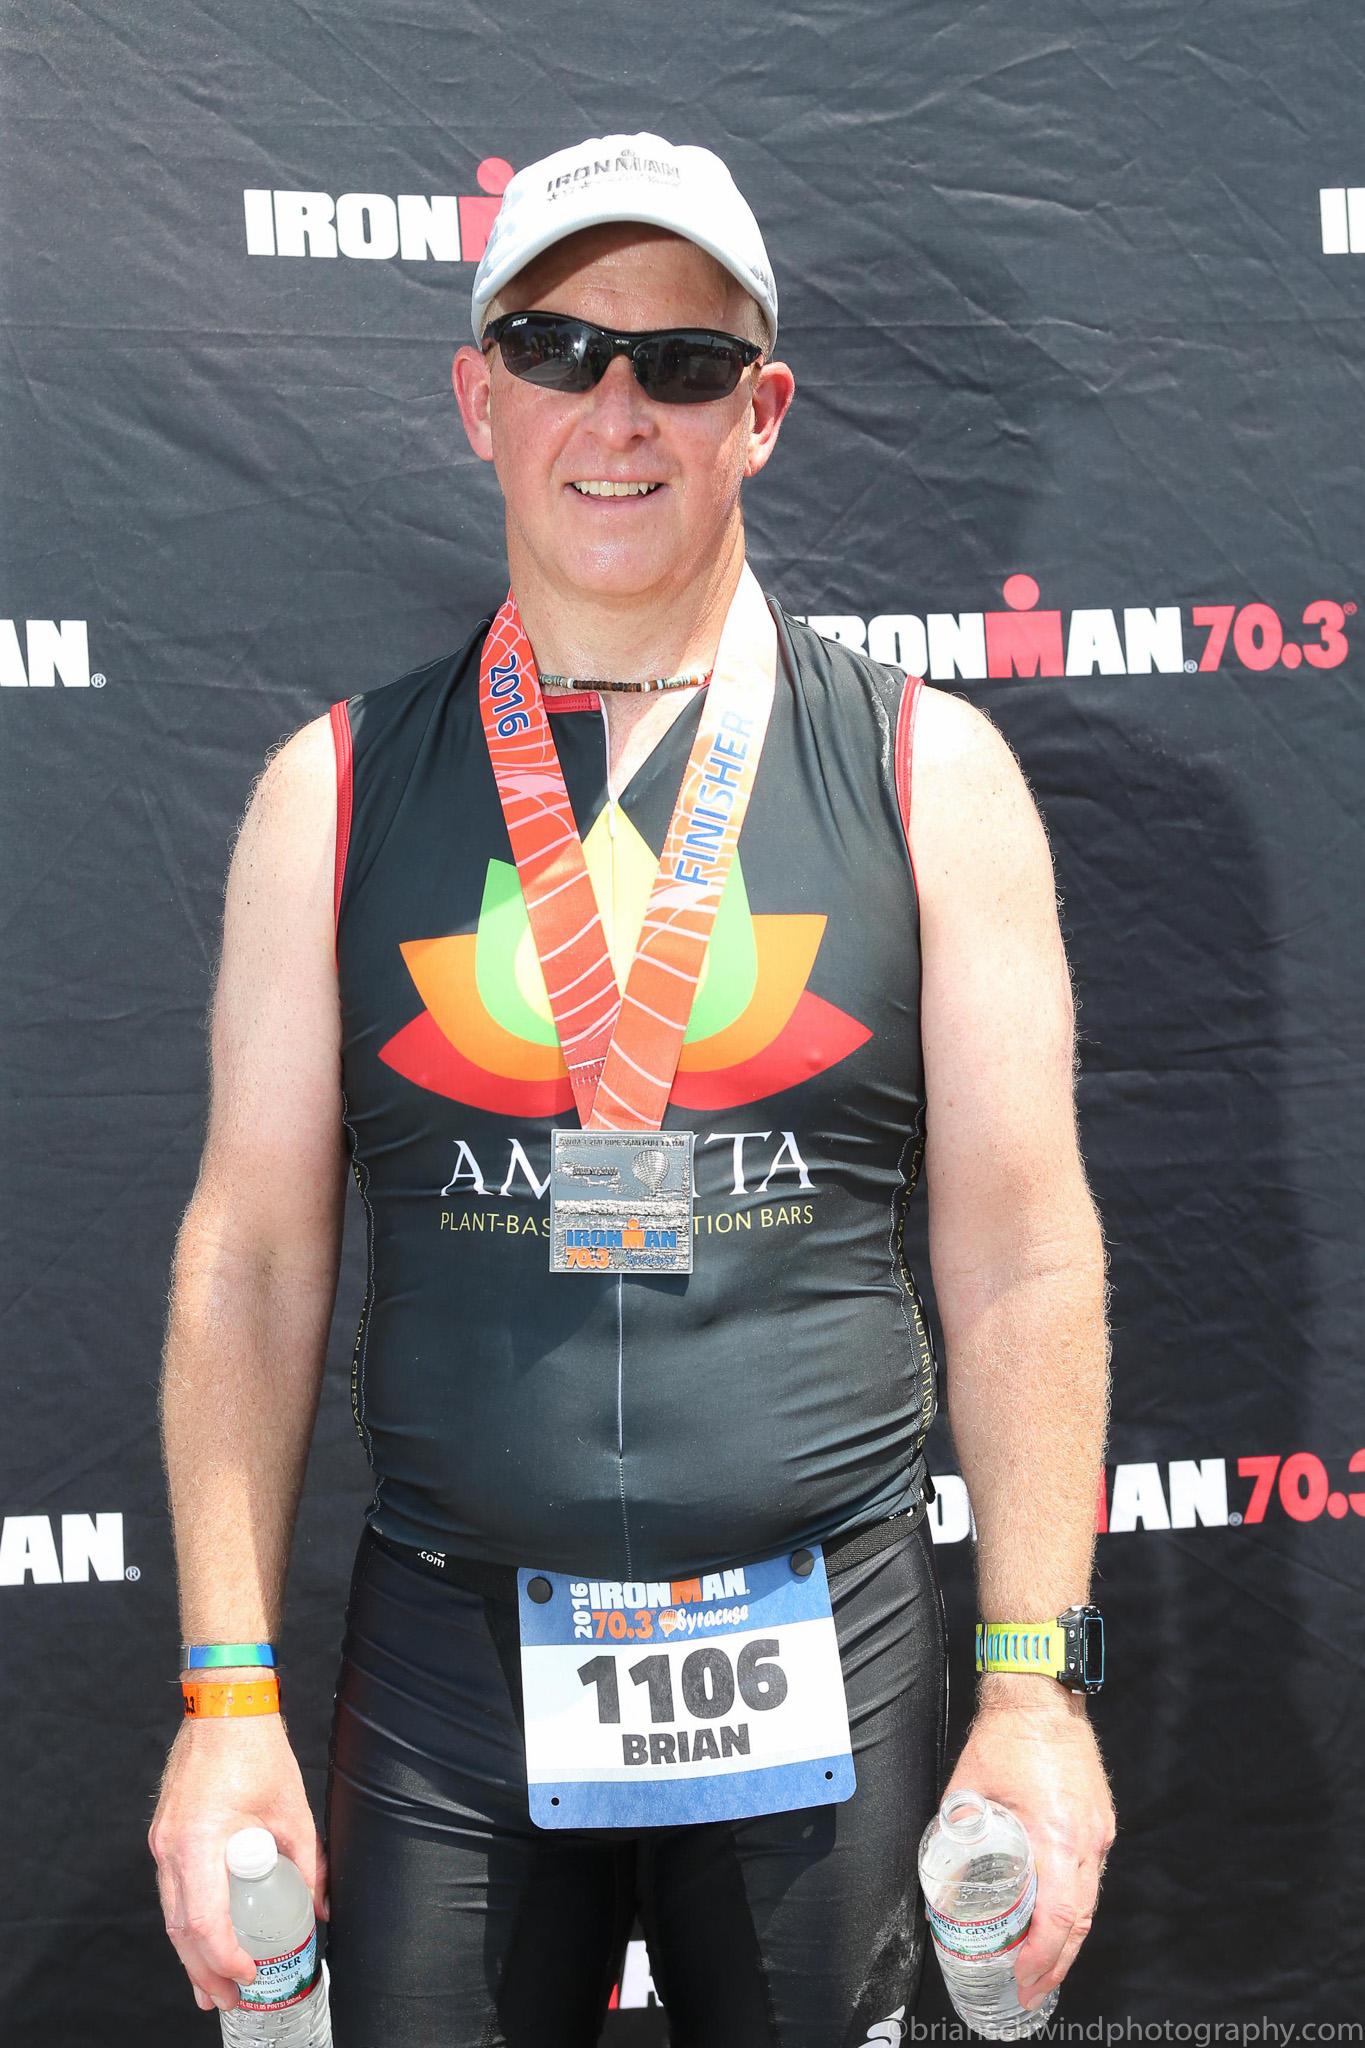 Ironman 70.3 Syracuse 2016-20160622015.jpg